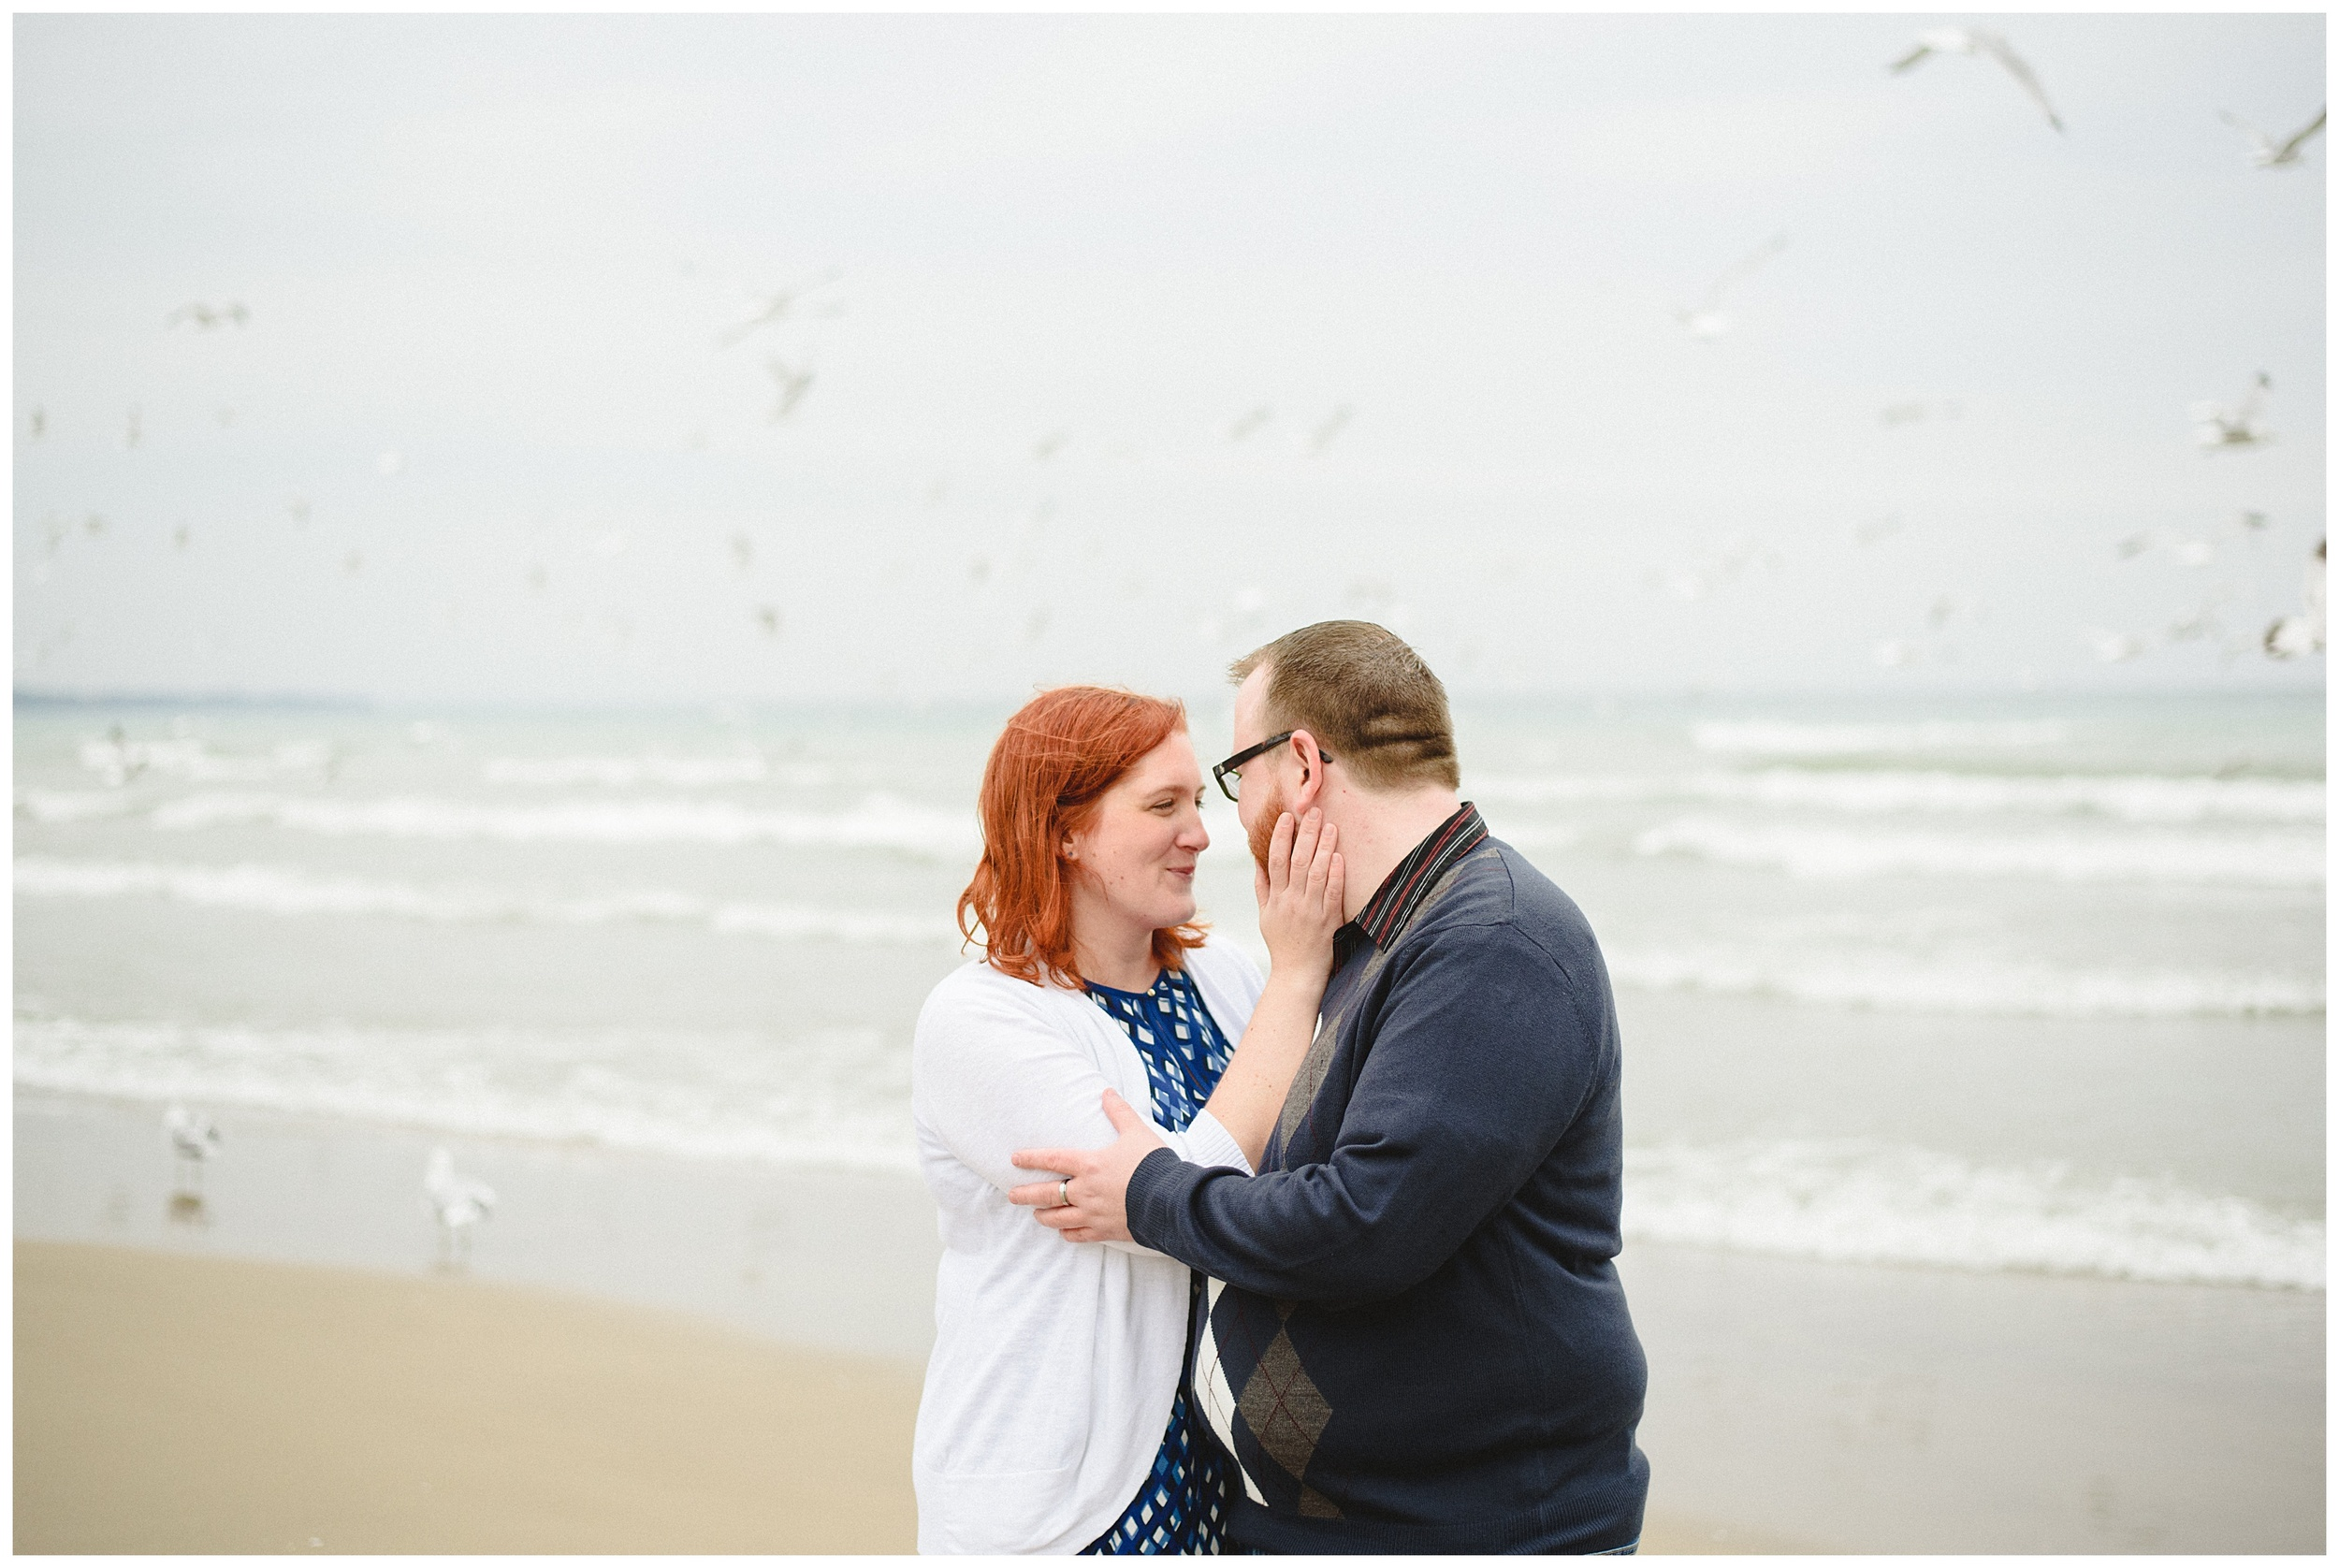 Arynn Photography, Scarborough Bluffs engagement shoot, Toronto Weddding Photographer, Durham Wedding Photographer, Geeky Engagement, beach engagement